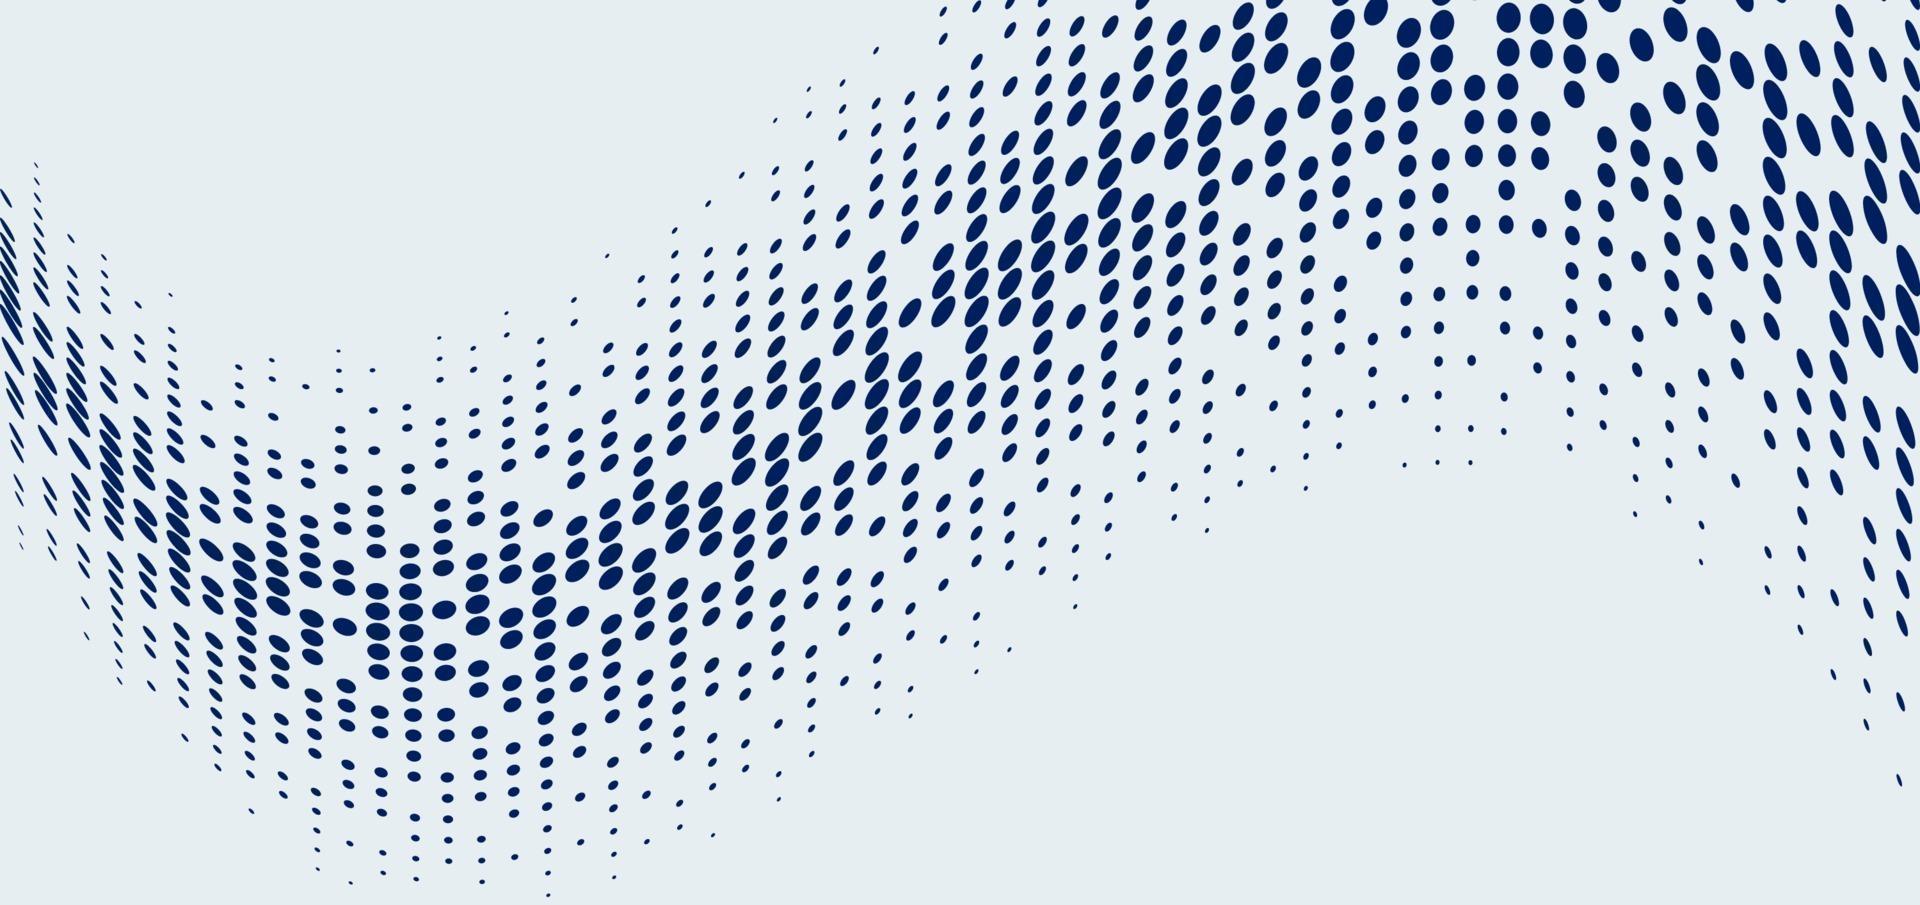 abstracte technologie futuristische stijl big data blauwe geometrische cirkelpatroon golf halftone op witte achtergrond en textuur vector